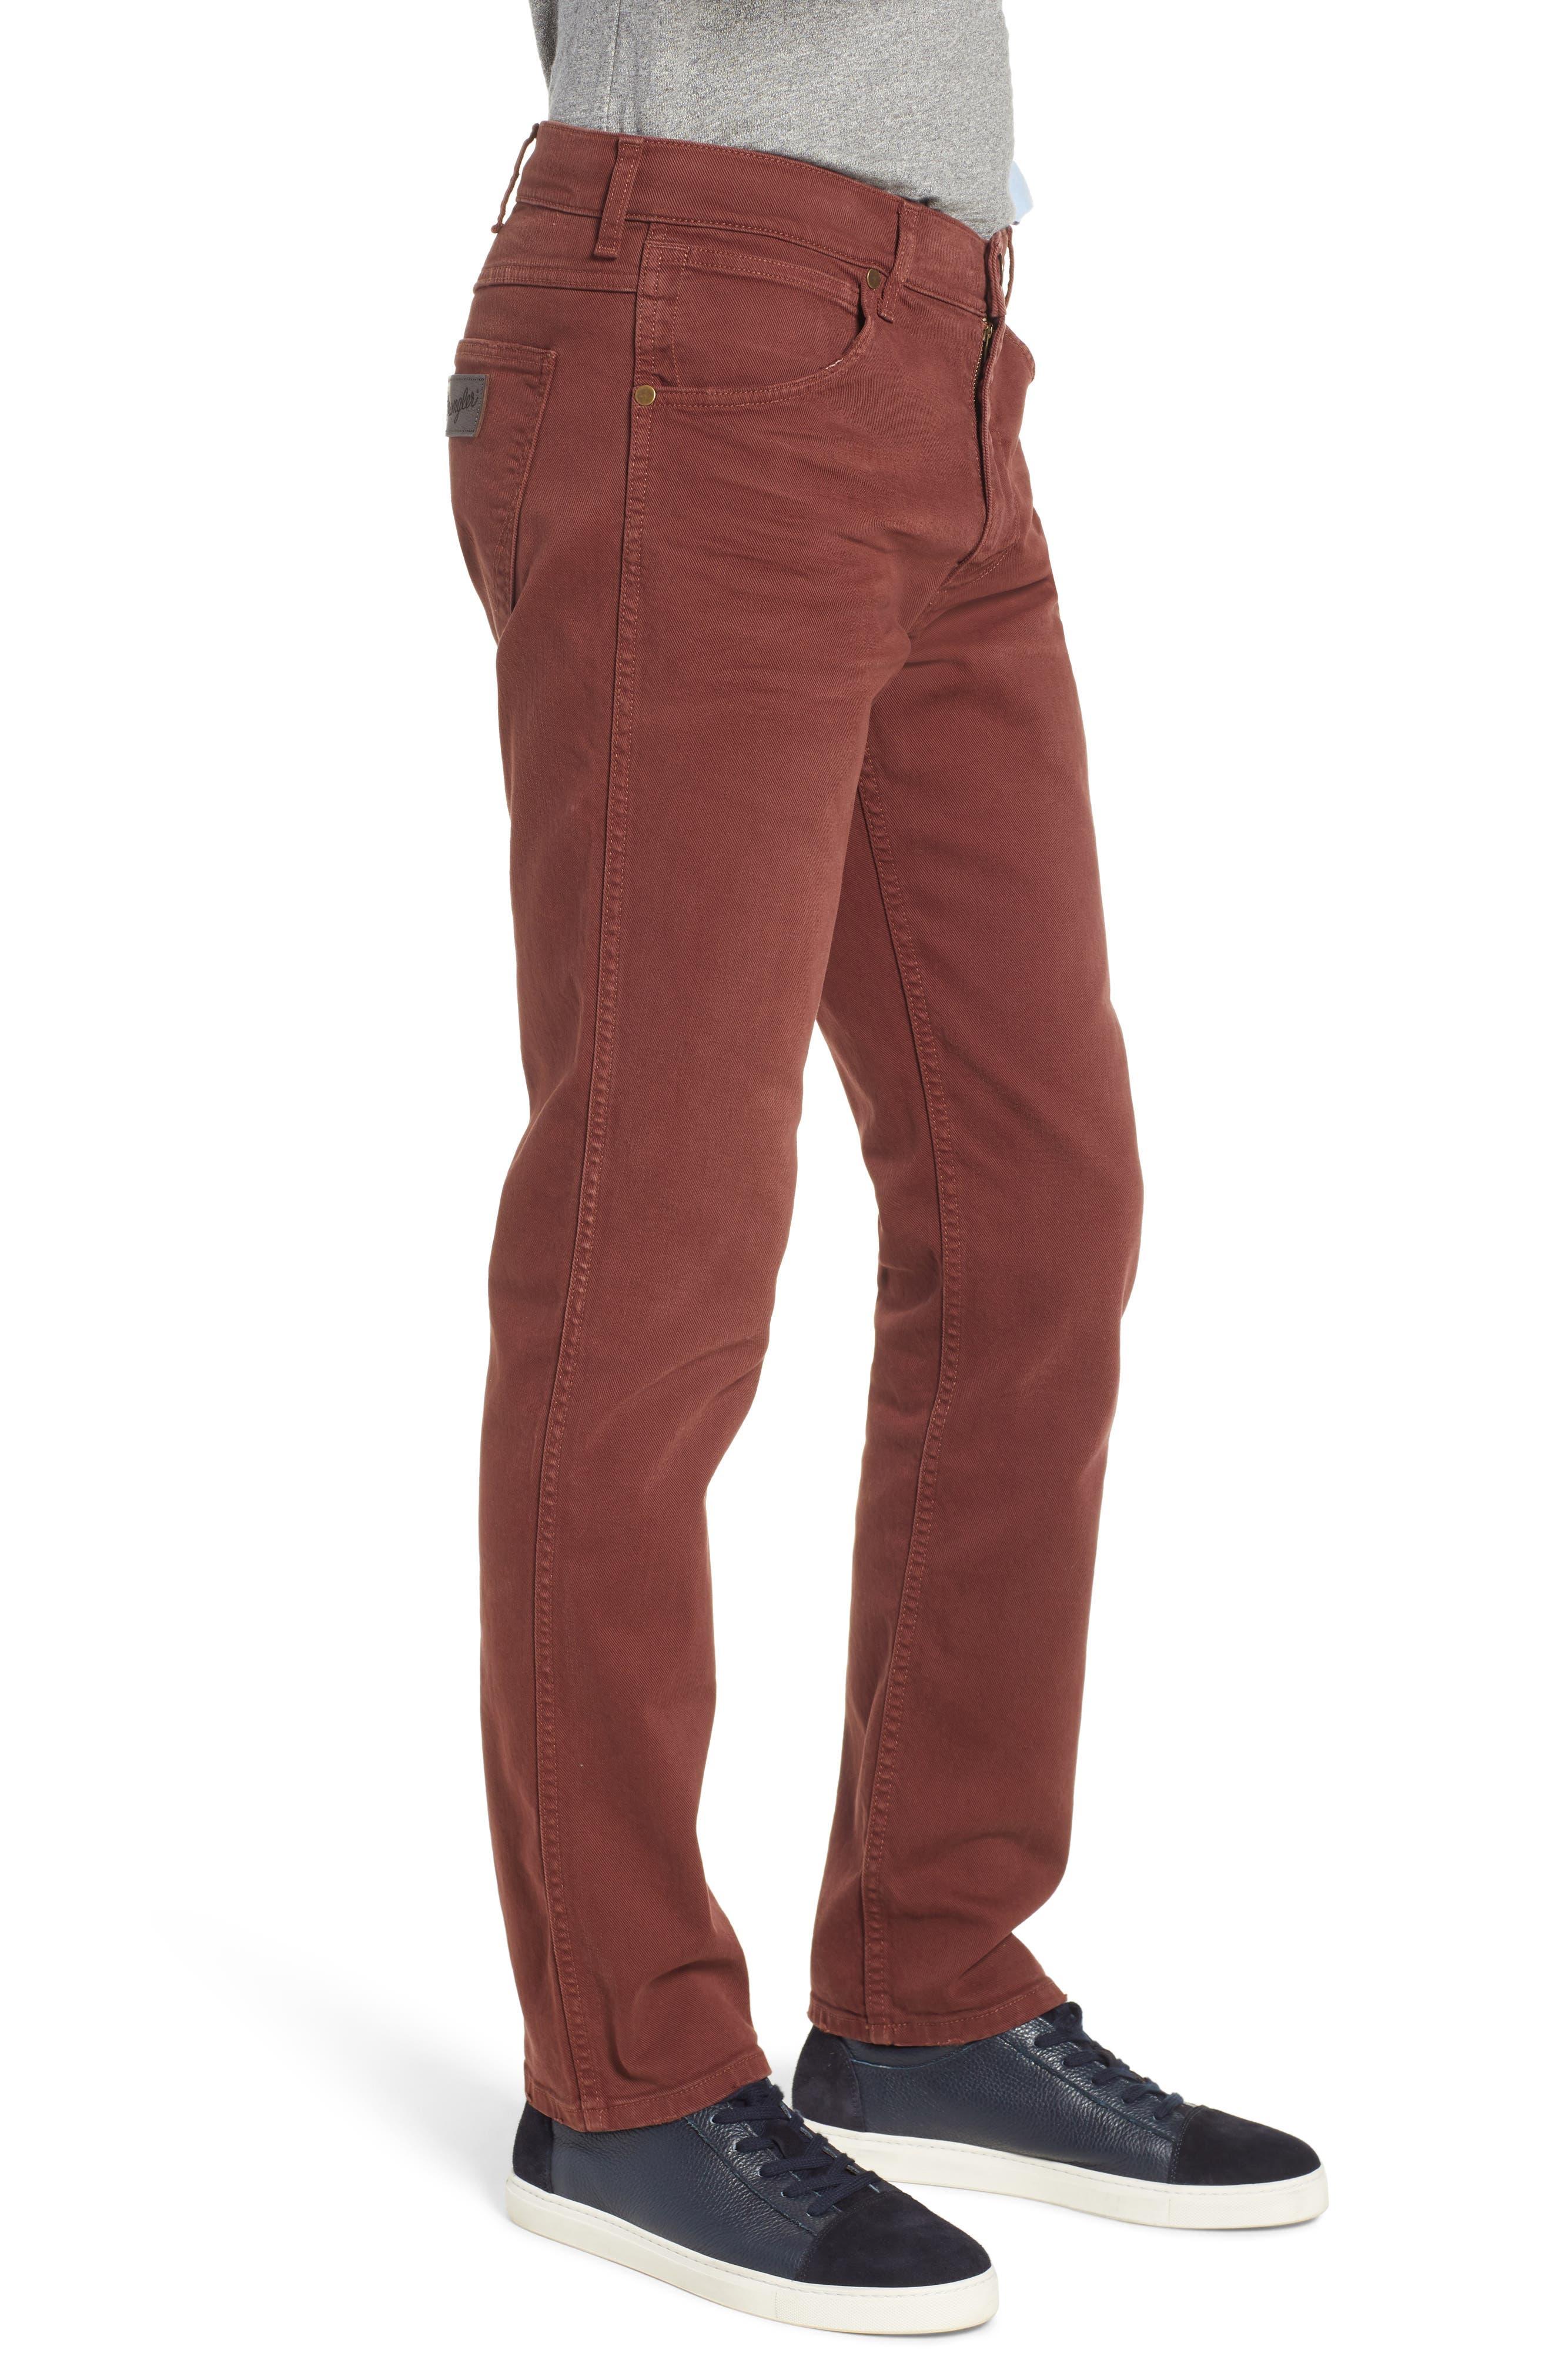 Greensboro Straight Leg Twill Pants,                             Alternate thumbnail 3, color,                             MAHOGANY RED